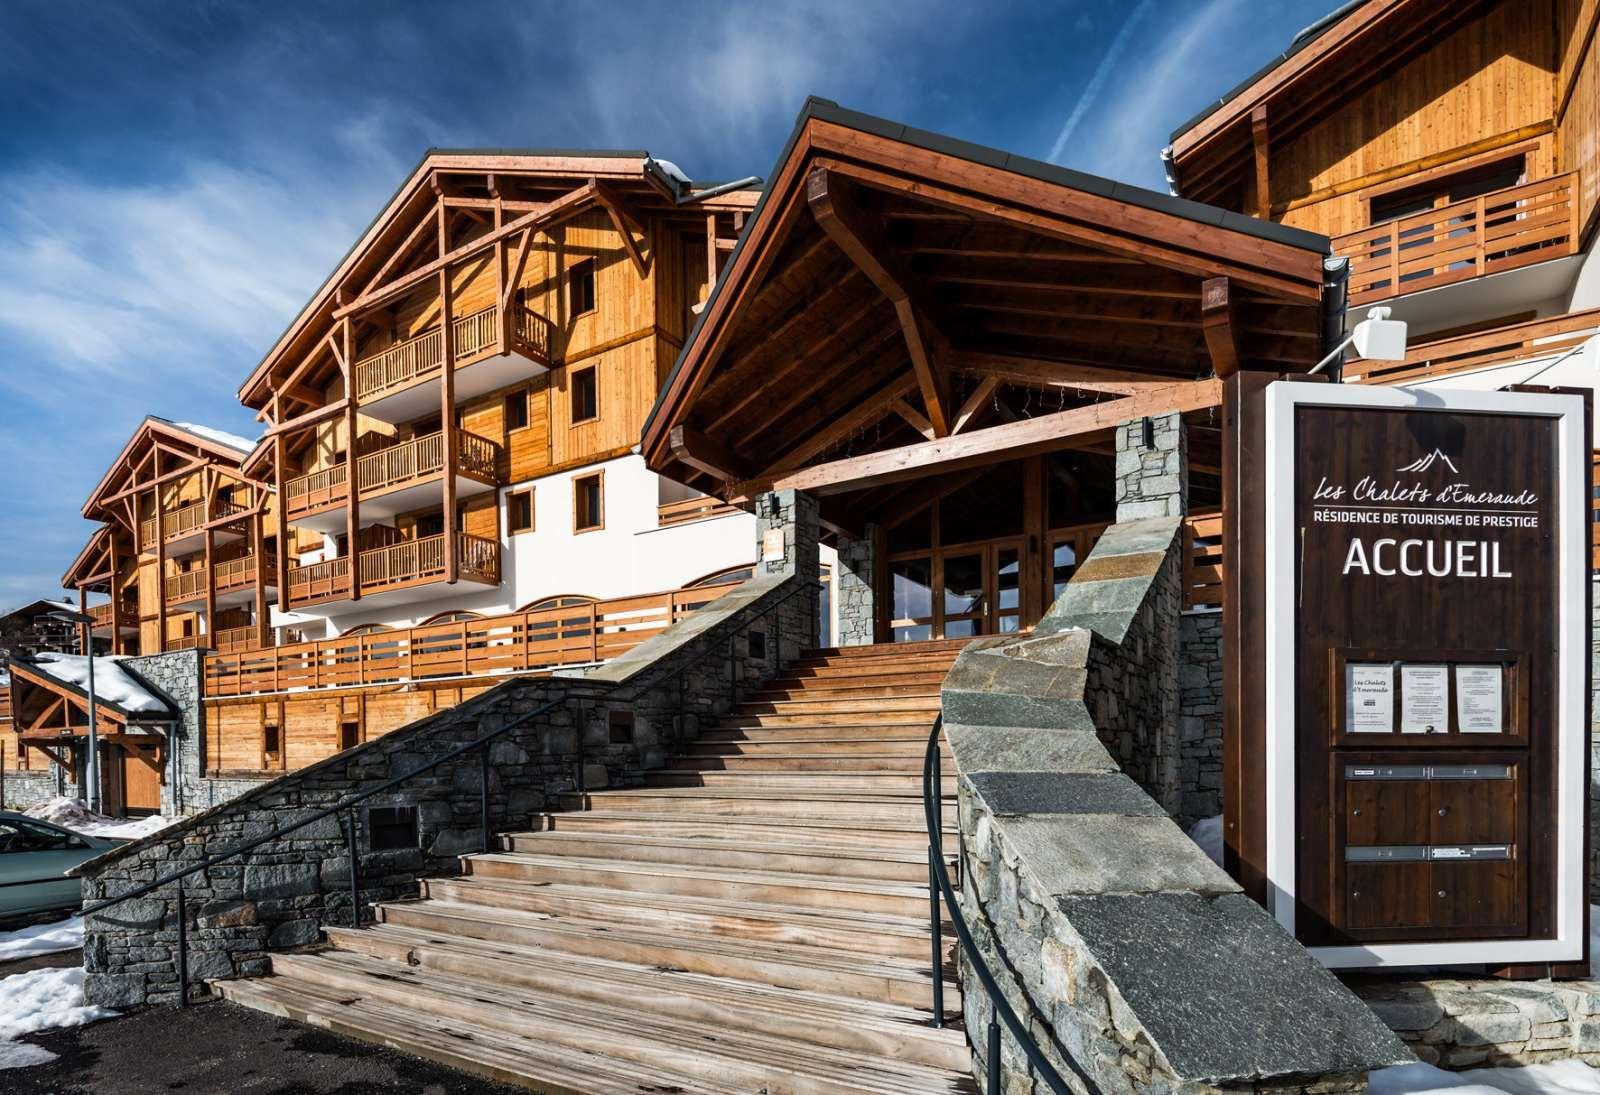 Résidence Les Chalets D Emeraude Location Ski Les Saisies Vacances Lagrange Iziva Com Location Ski Vacances En France Vacances